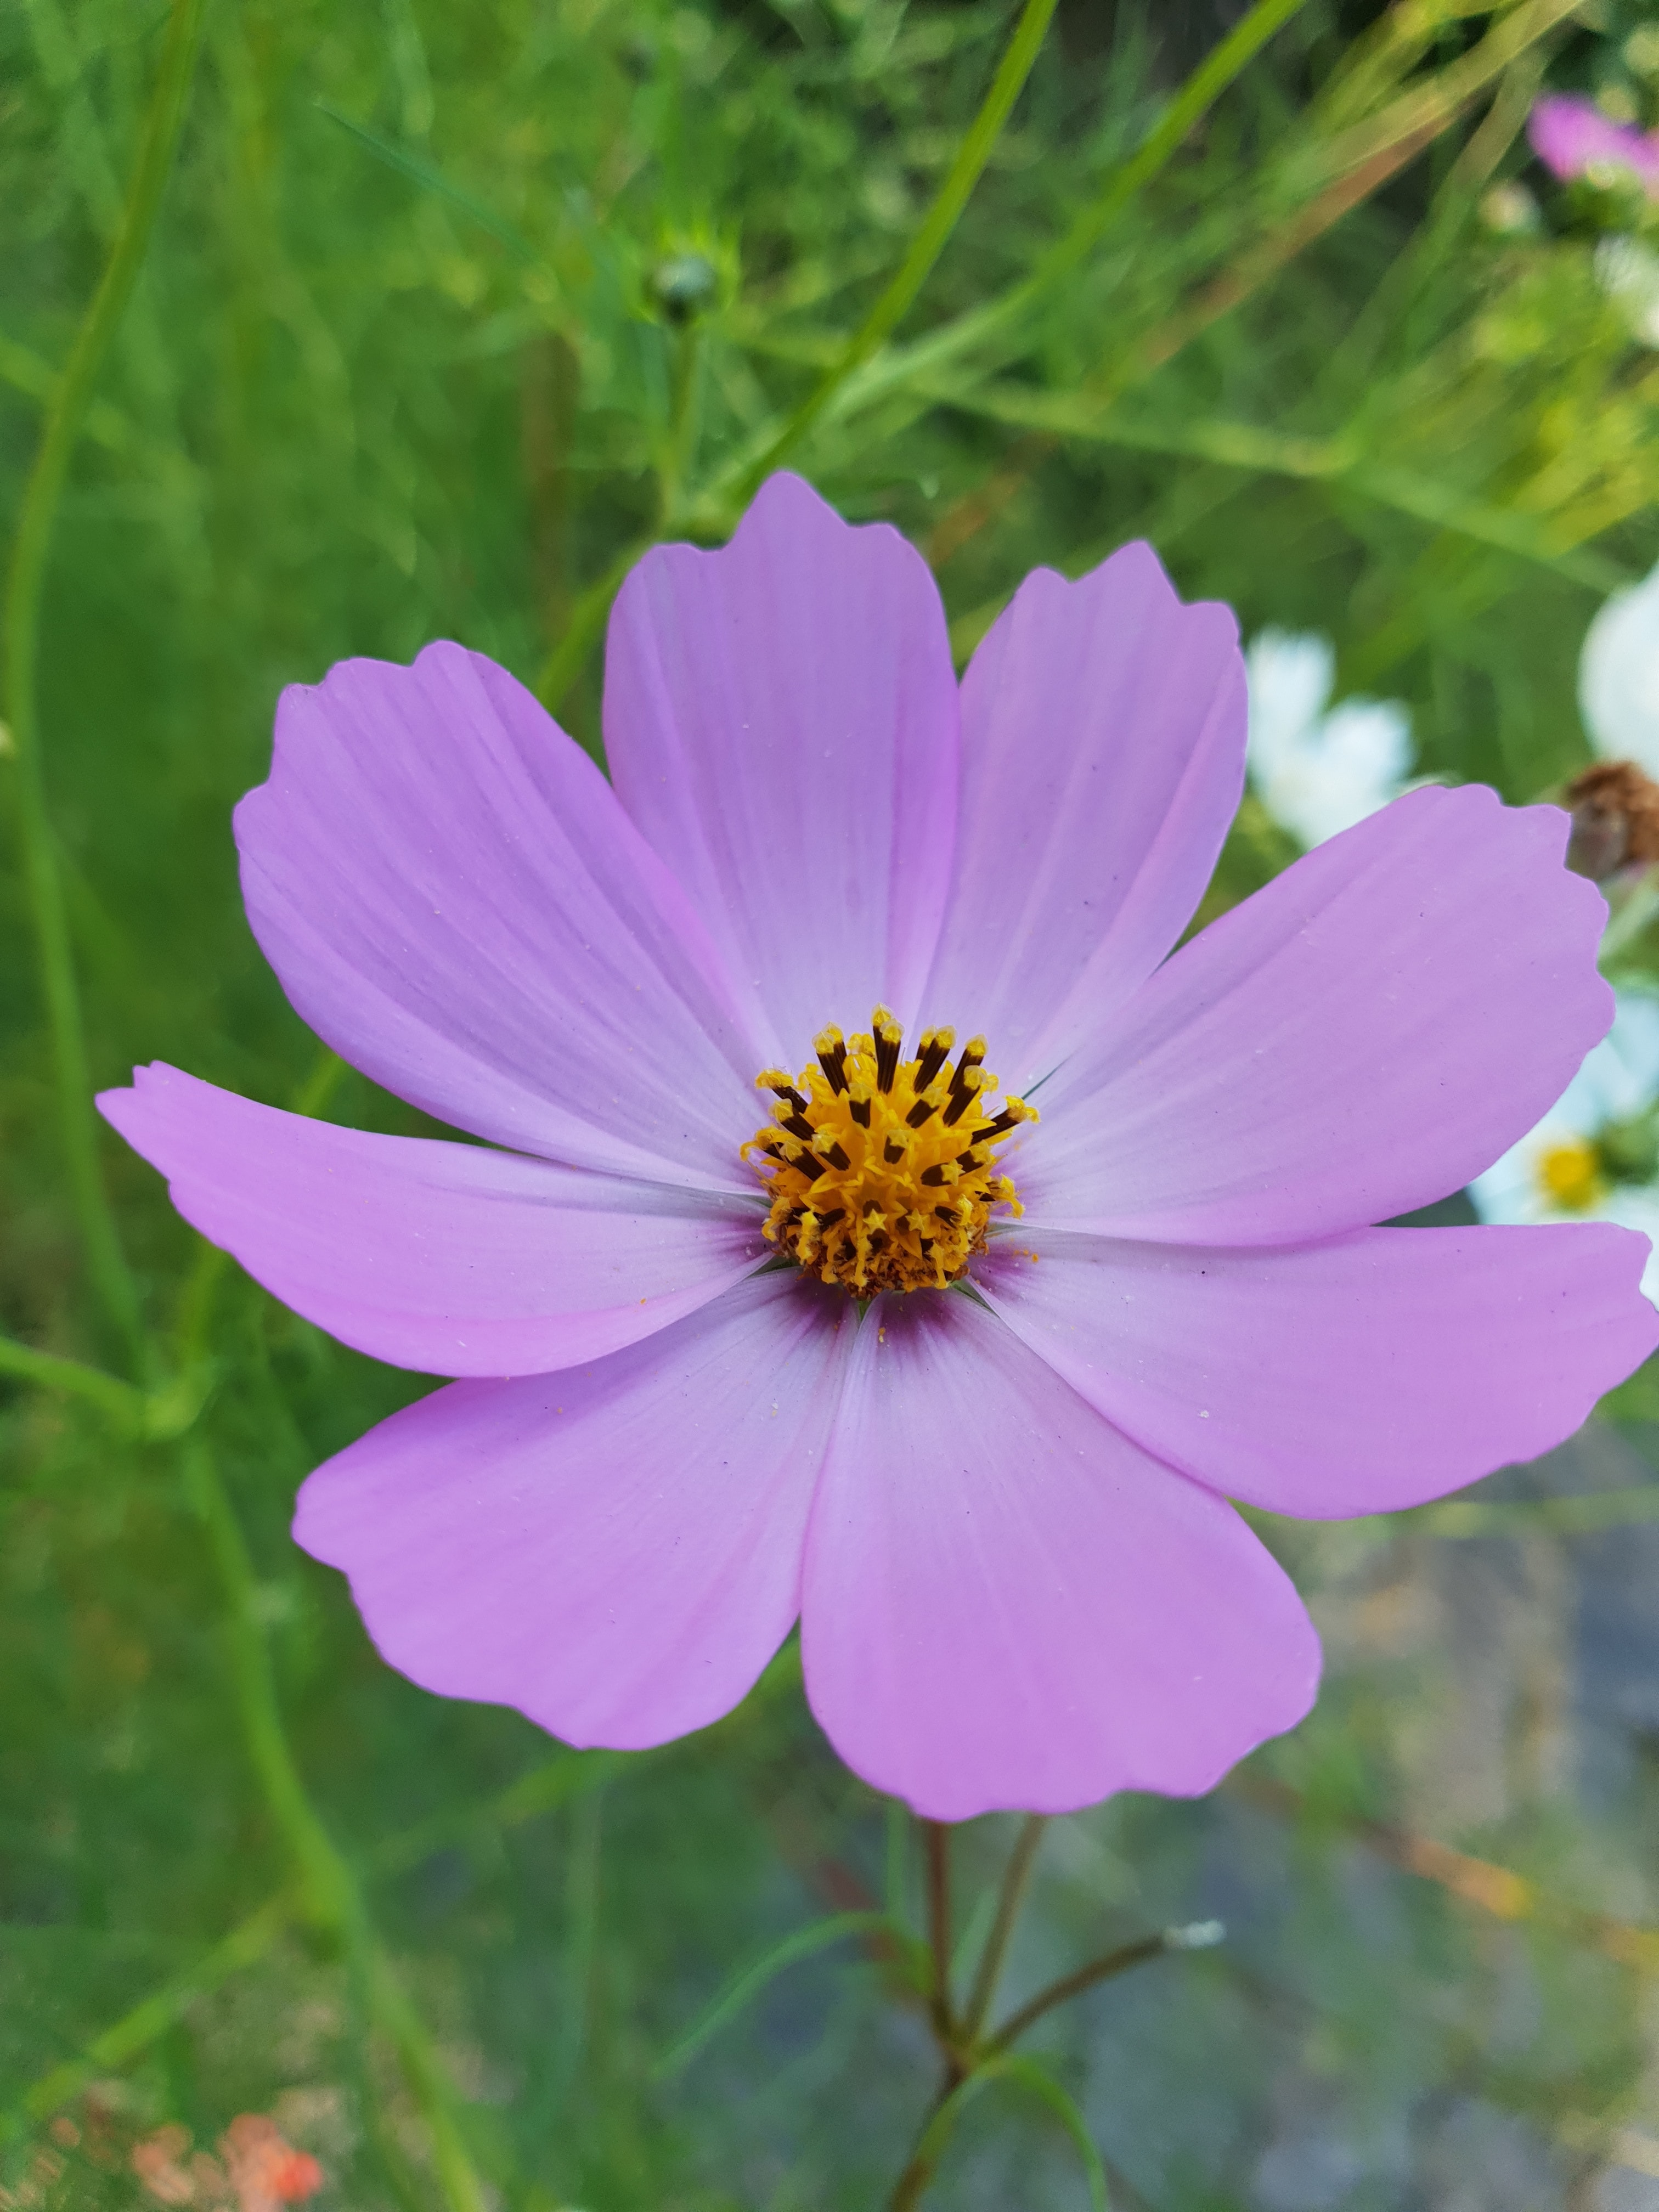 Purple flower in the grass photo